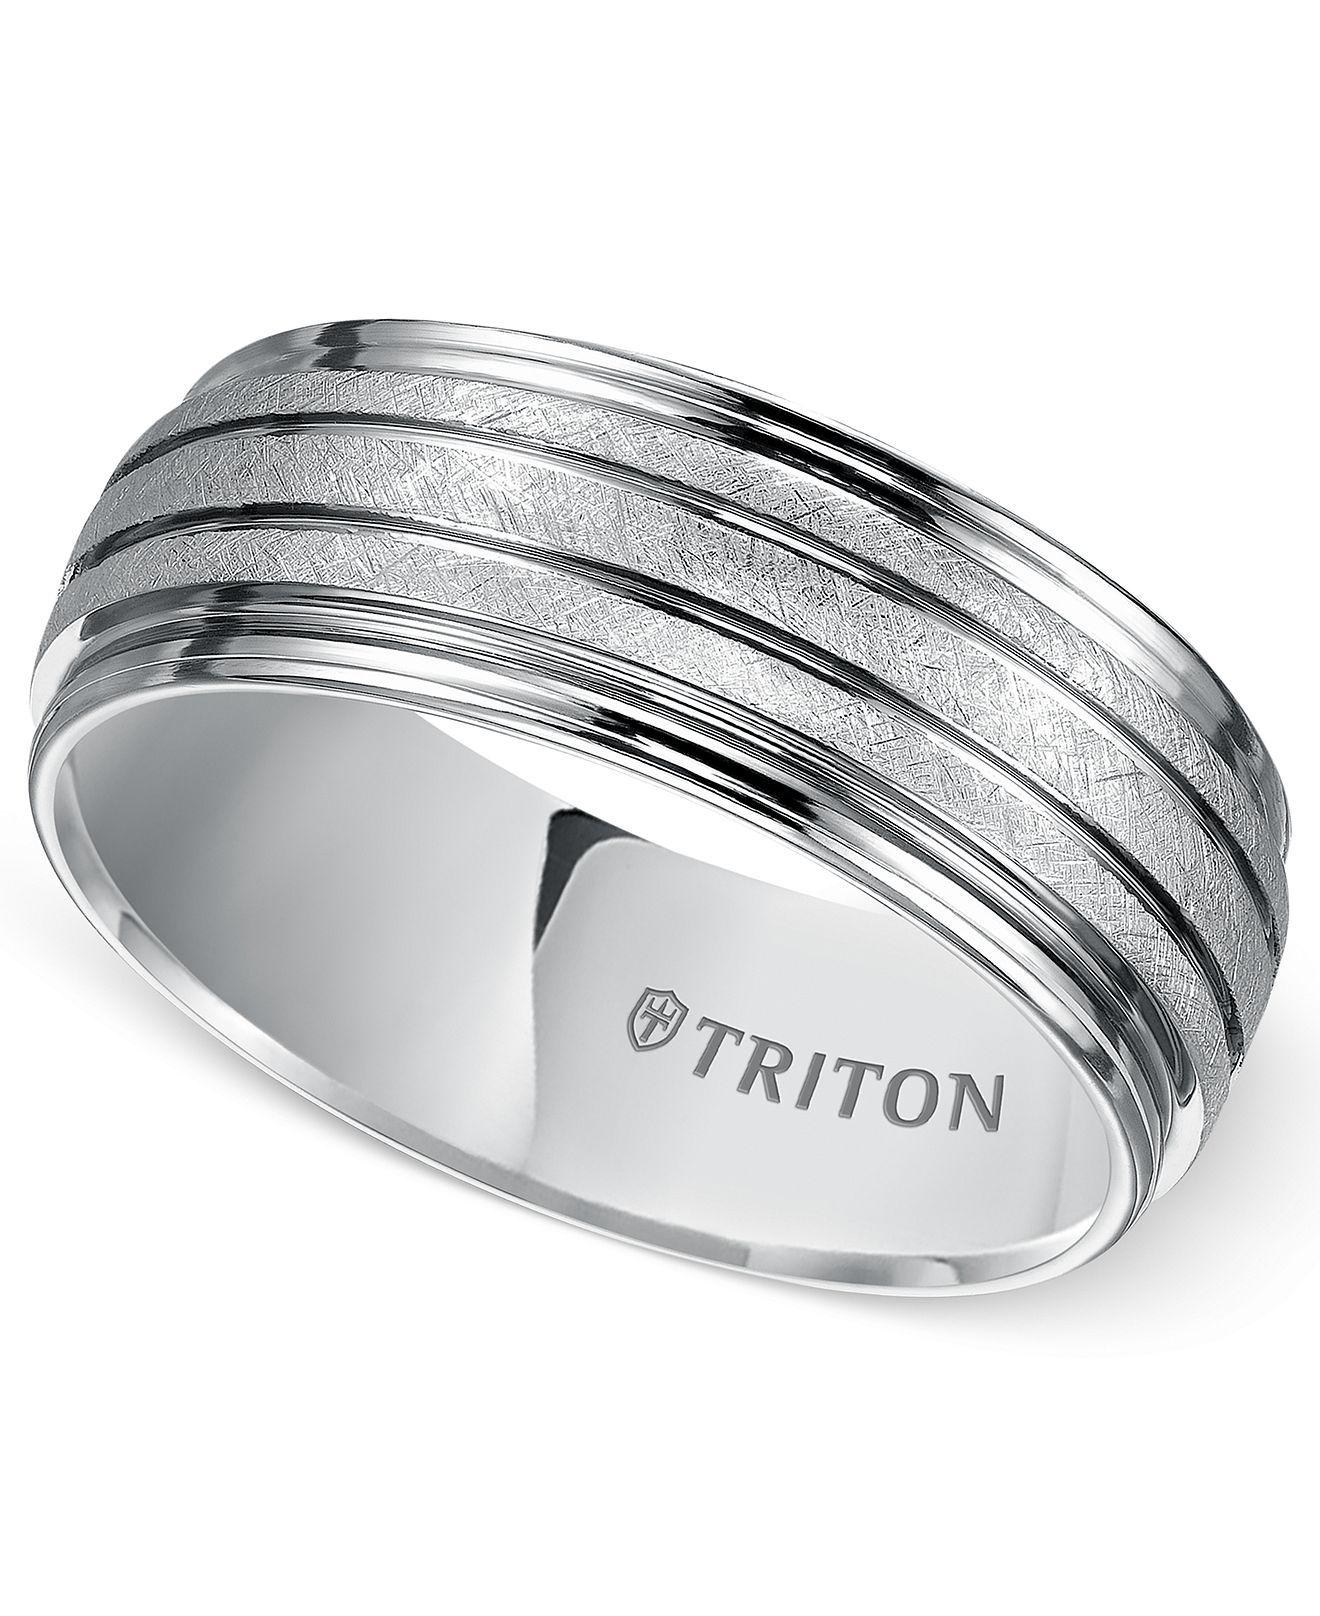 Triton Men's White Tungsten Carbide Ring, 8mm Comfort Fit